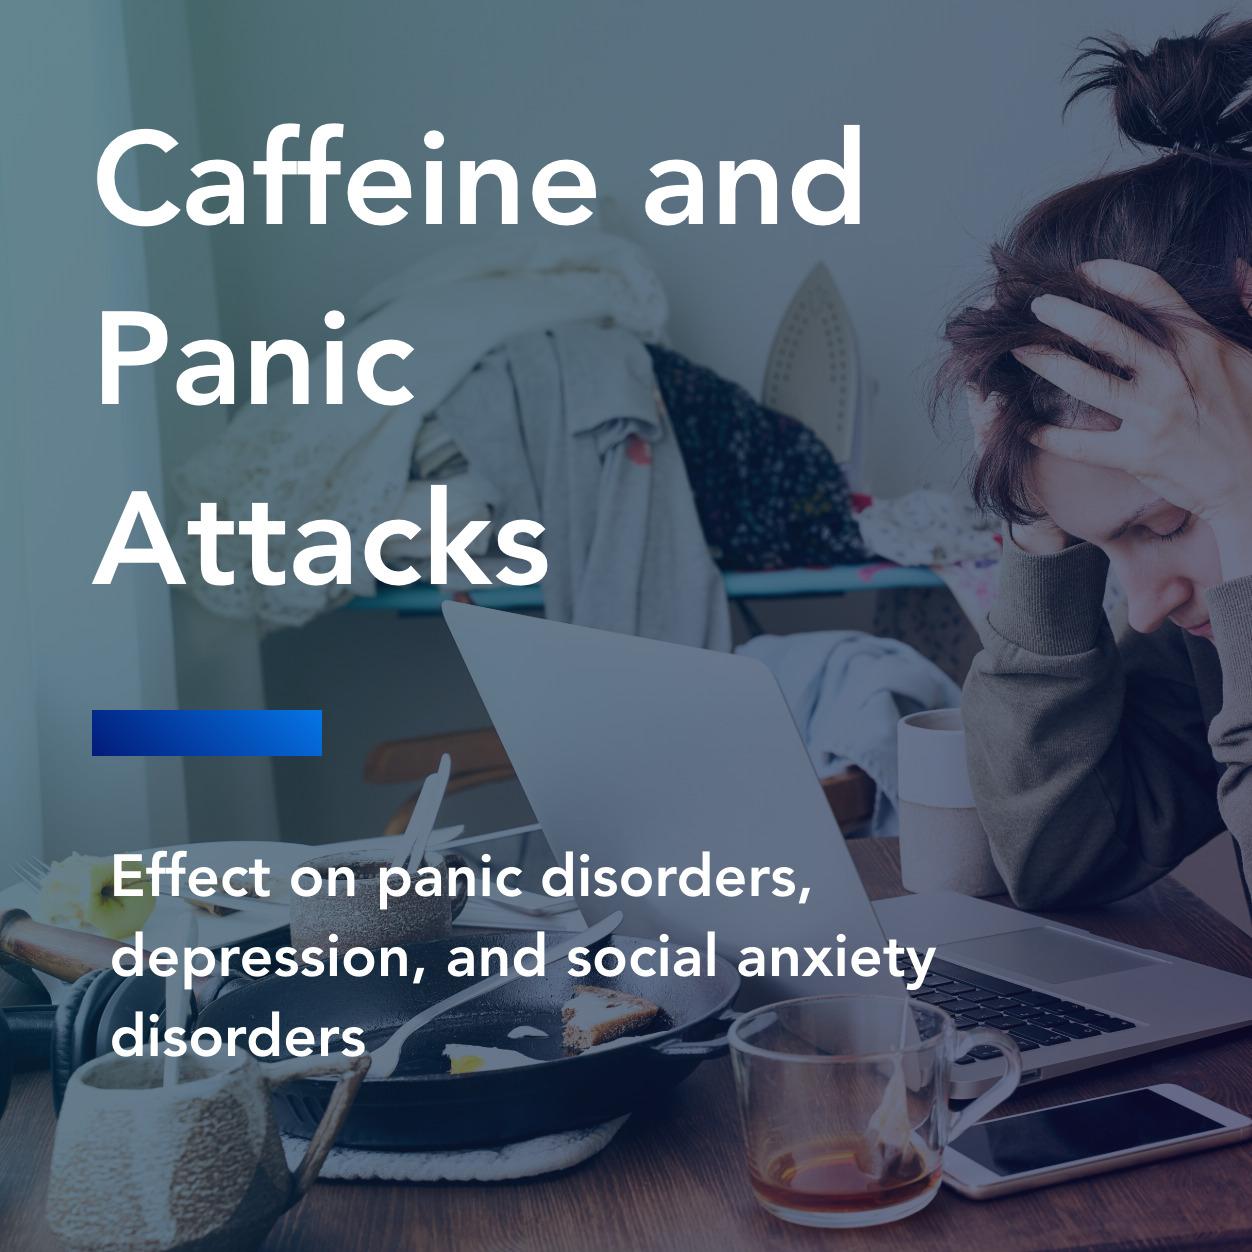 caffeine and panic attacks title